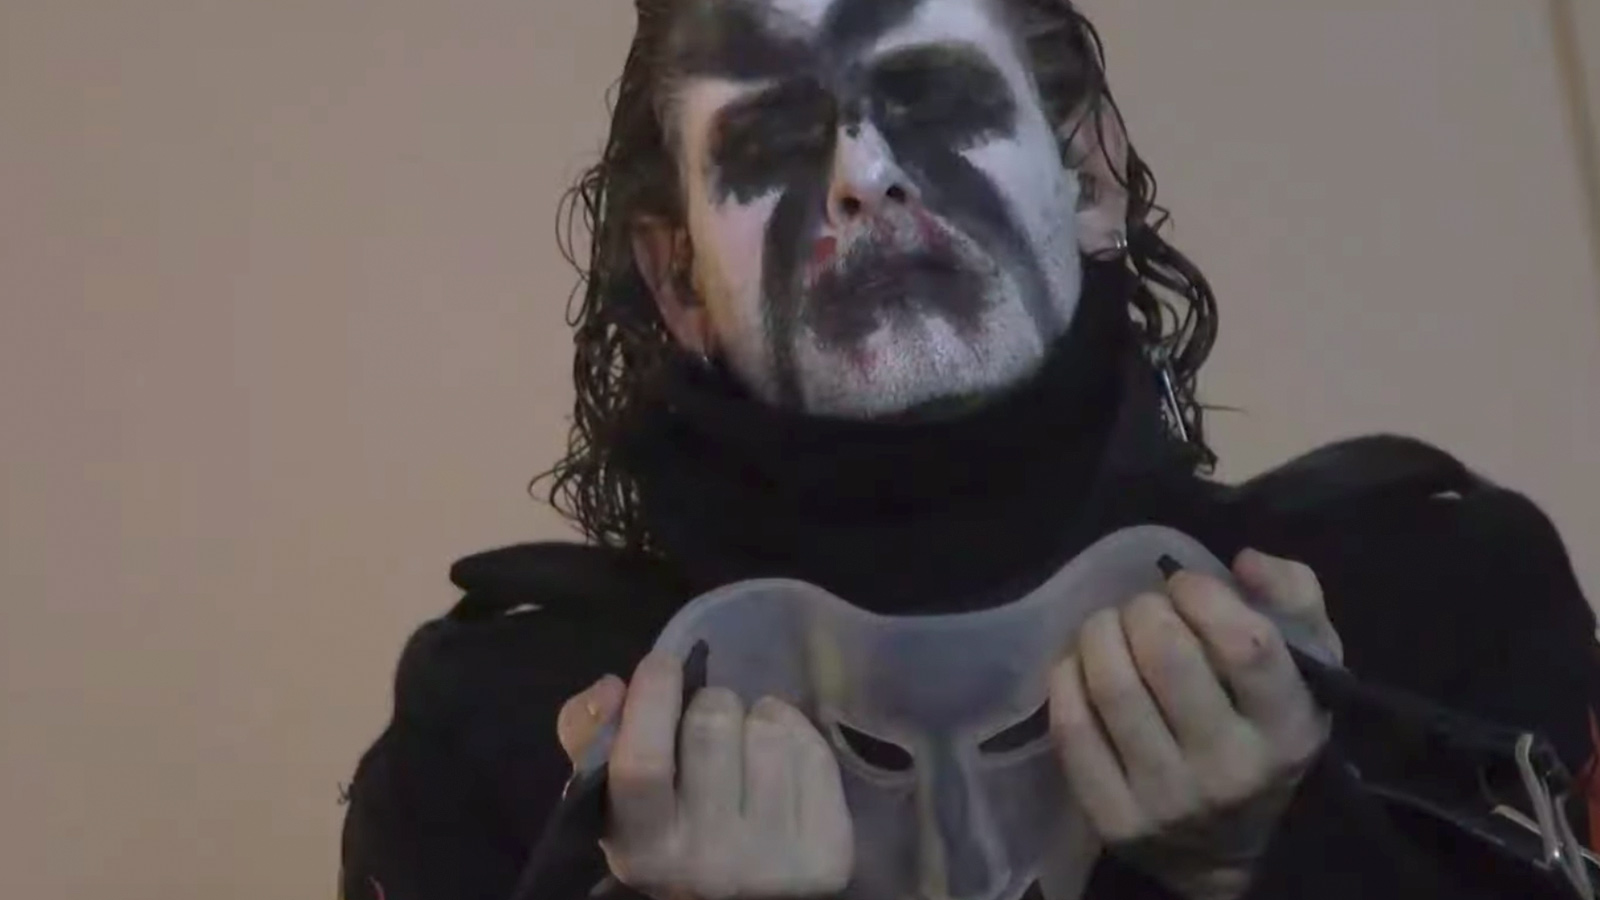 See Slipknot's Pre-Show Rituals, Backstage Antics in New Tour Recap Video